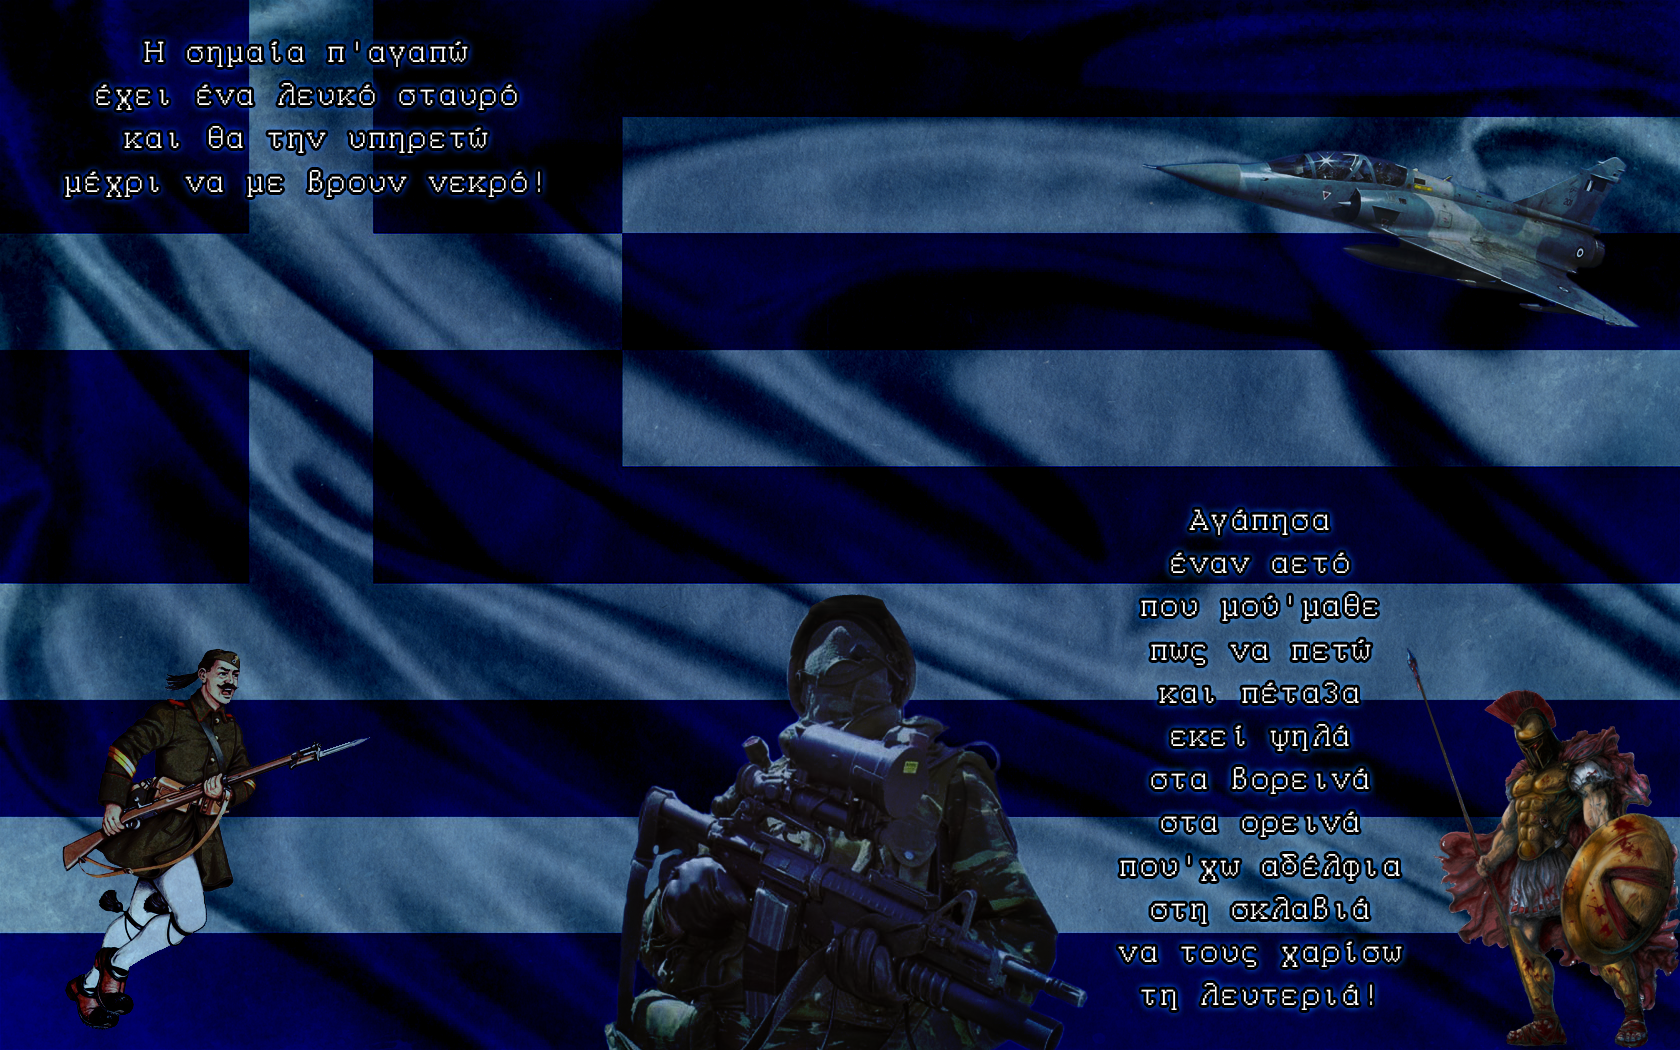 1680x1050 Greek army flag desktop PC and Mac wallpaper 1680x1050